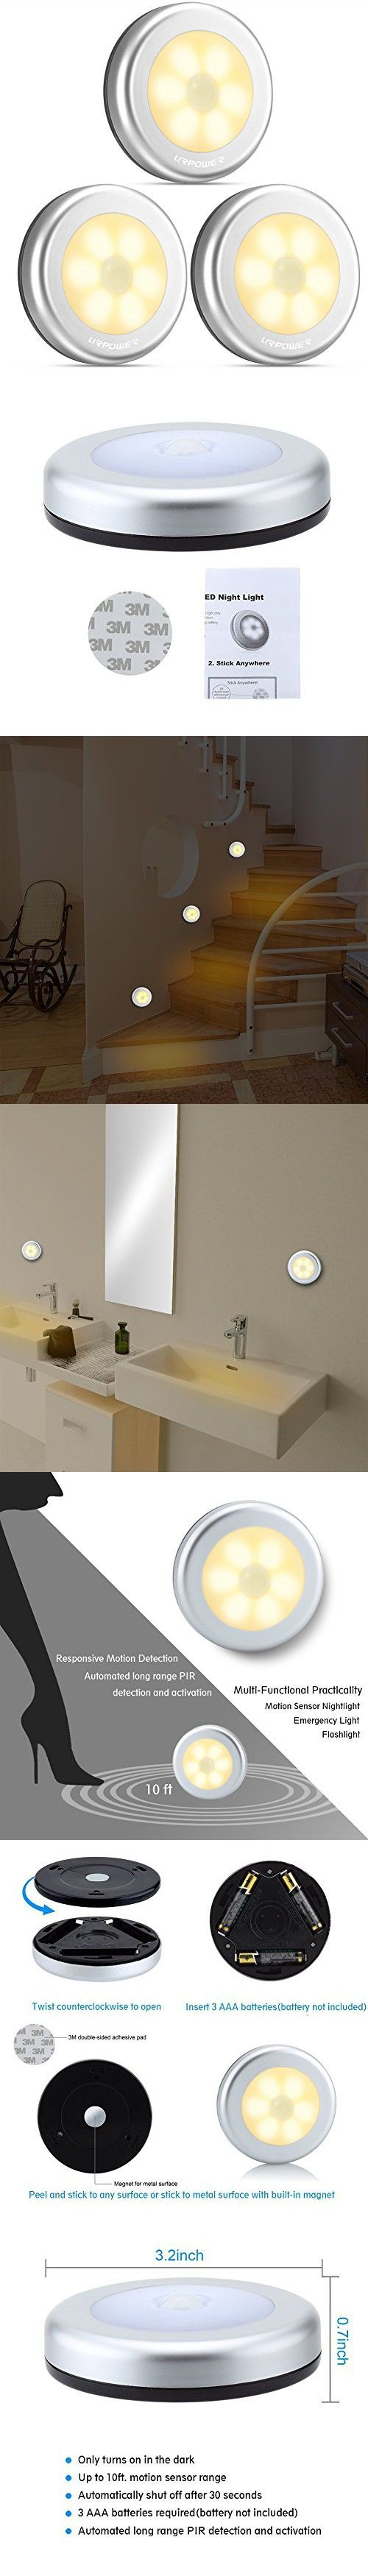 URPOWER Motion Sensor Light, Motion-sensing Battery Powered LED Stick-Anywhere Nightlight,Wall Light for Entrance,Hallway,Basement,Garage,Bathroom,Cabinet,Closet